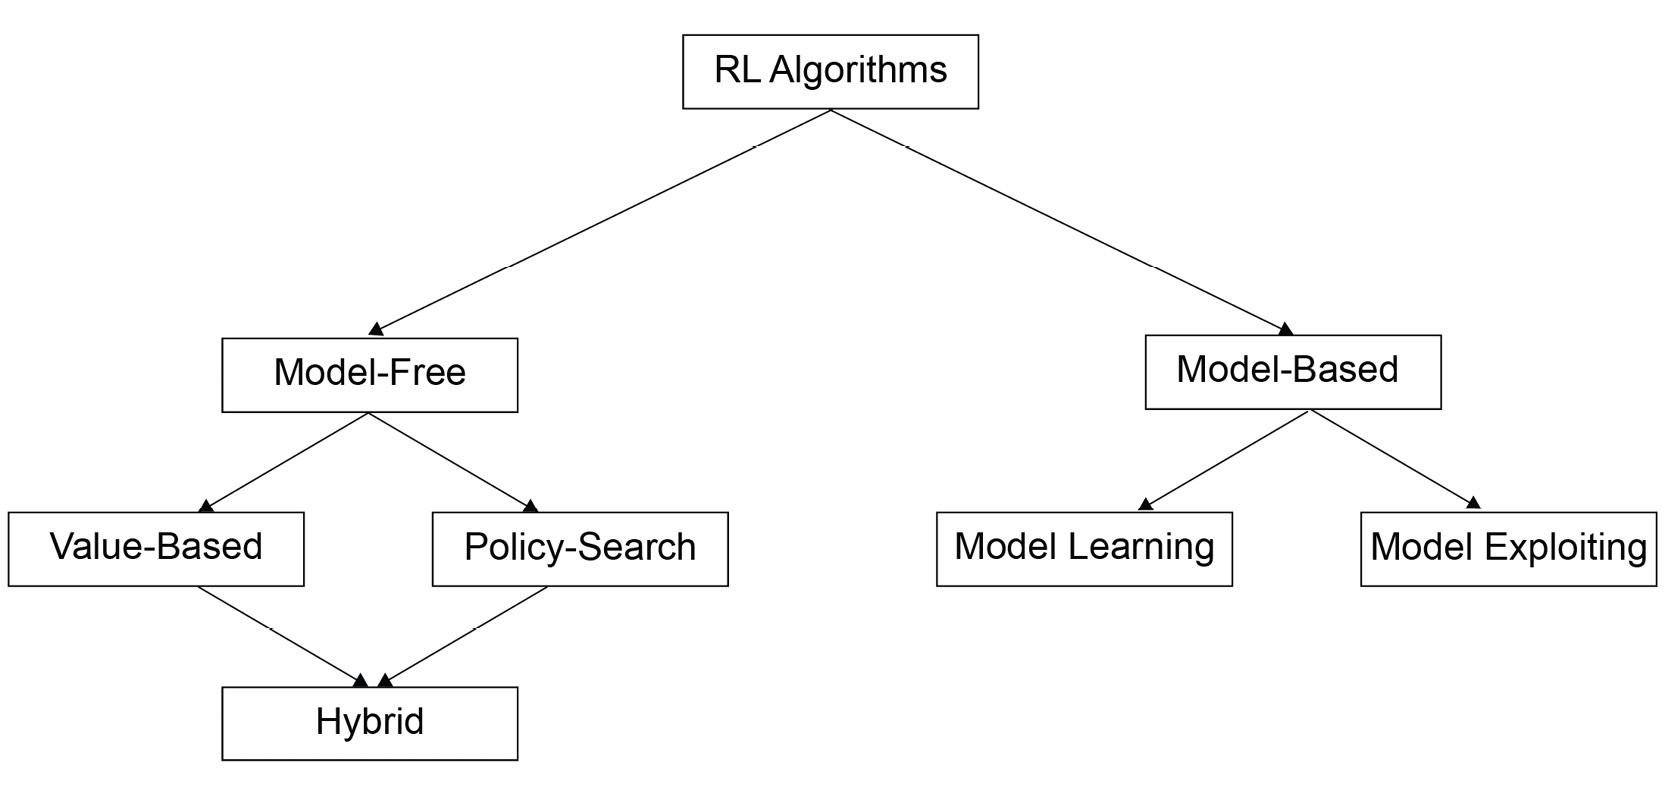 Figure 2.53: Taxonomy of RL algorithms